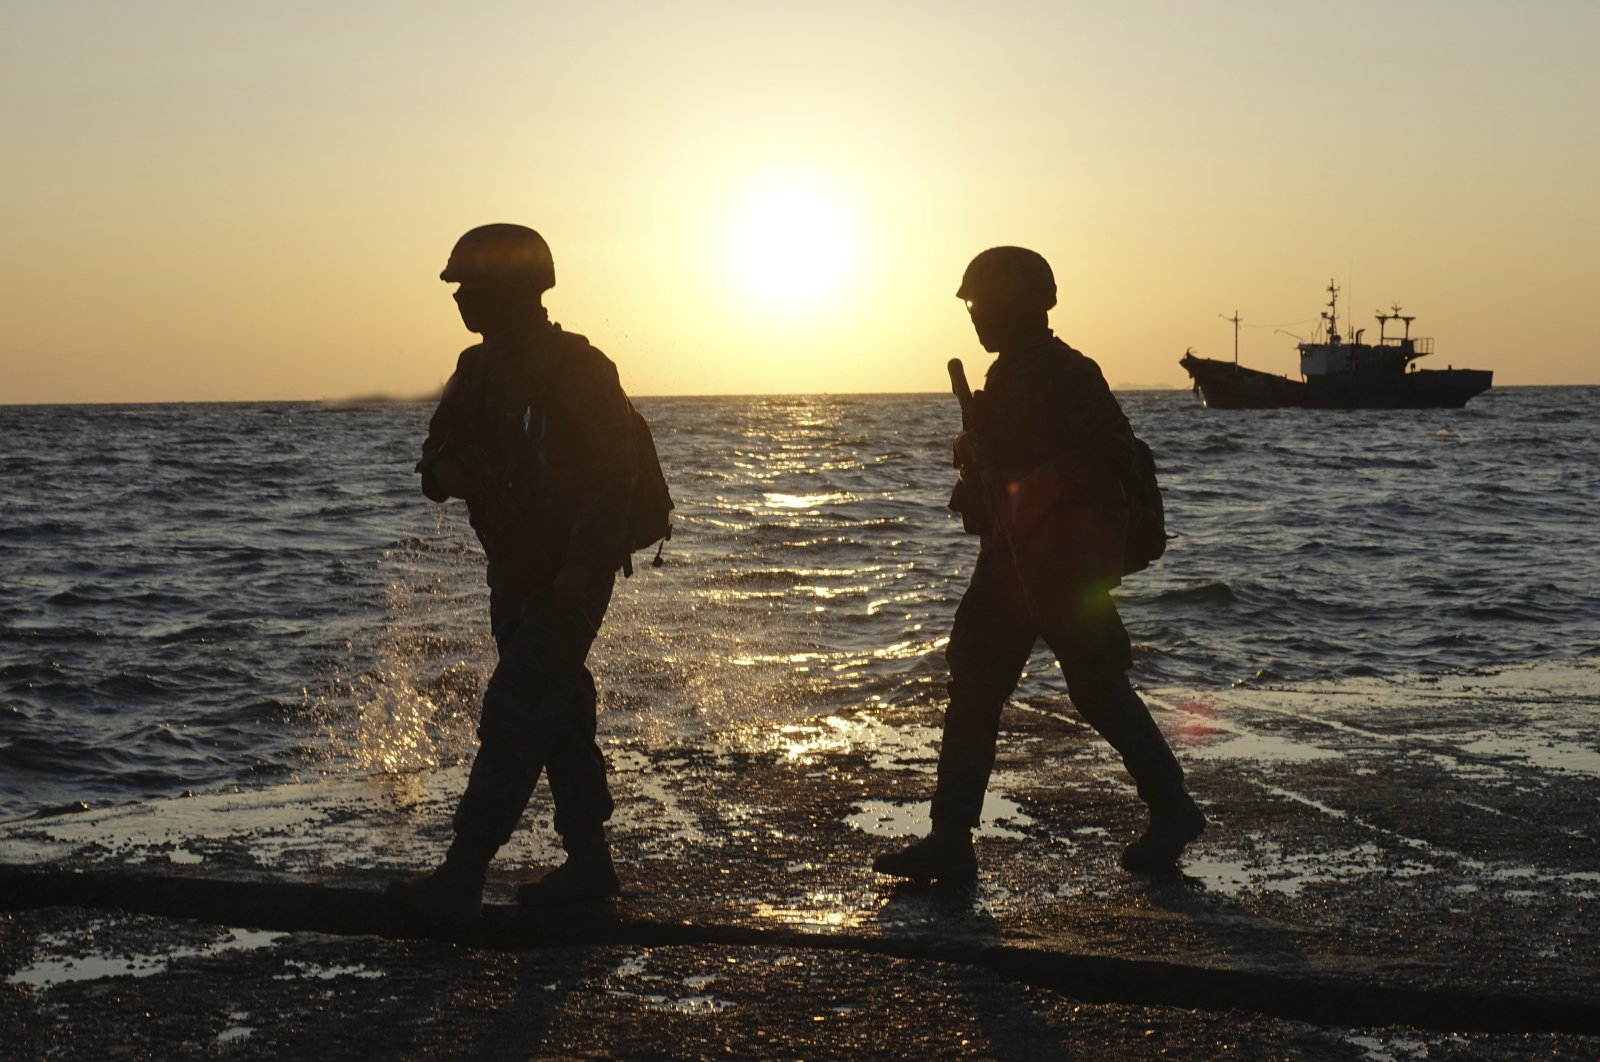 South Korean marine soldiers patrol on Yeonpyeong island, South Korea, Sept. 27, 2020. (AP Photo)